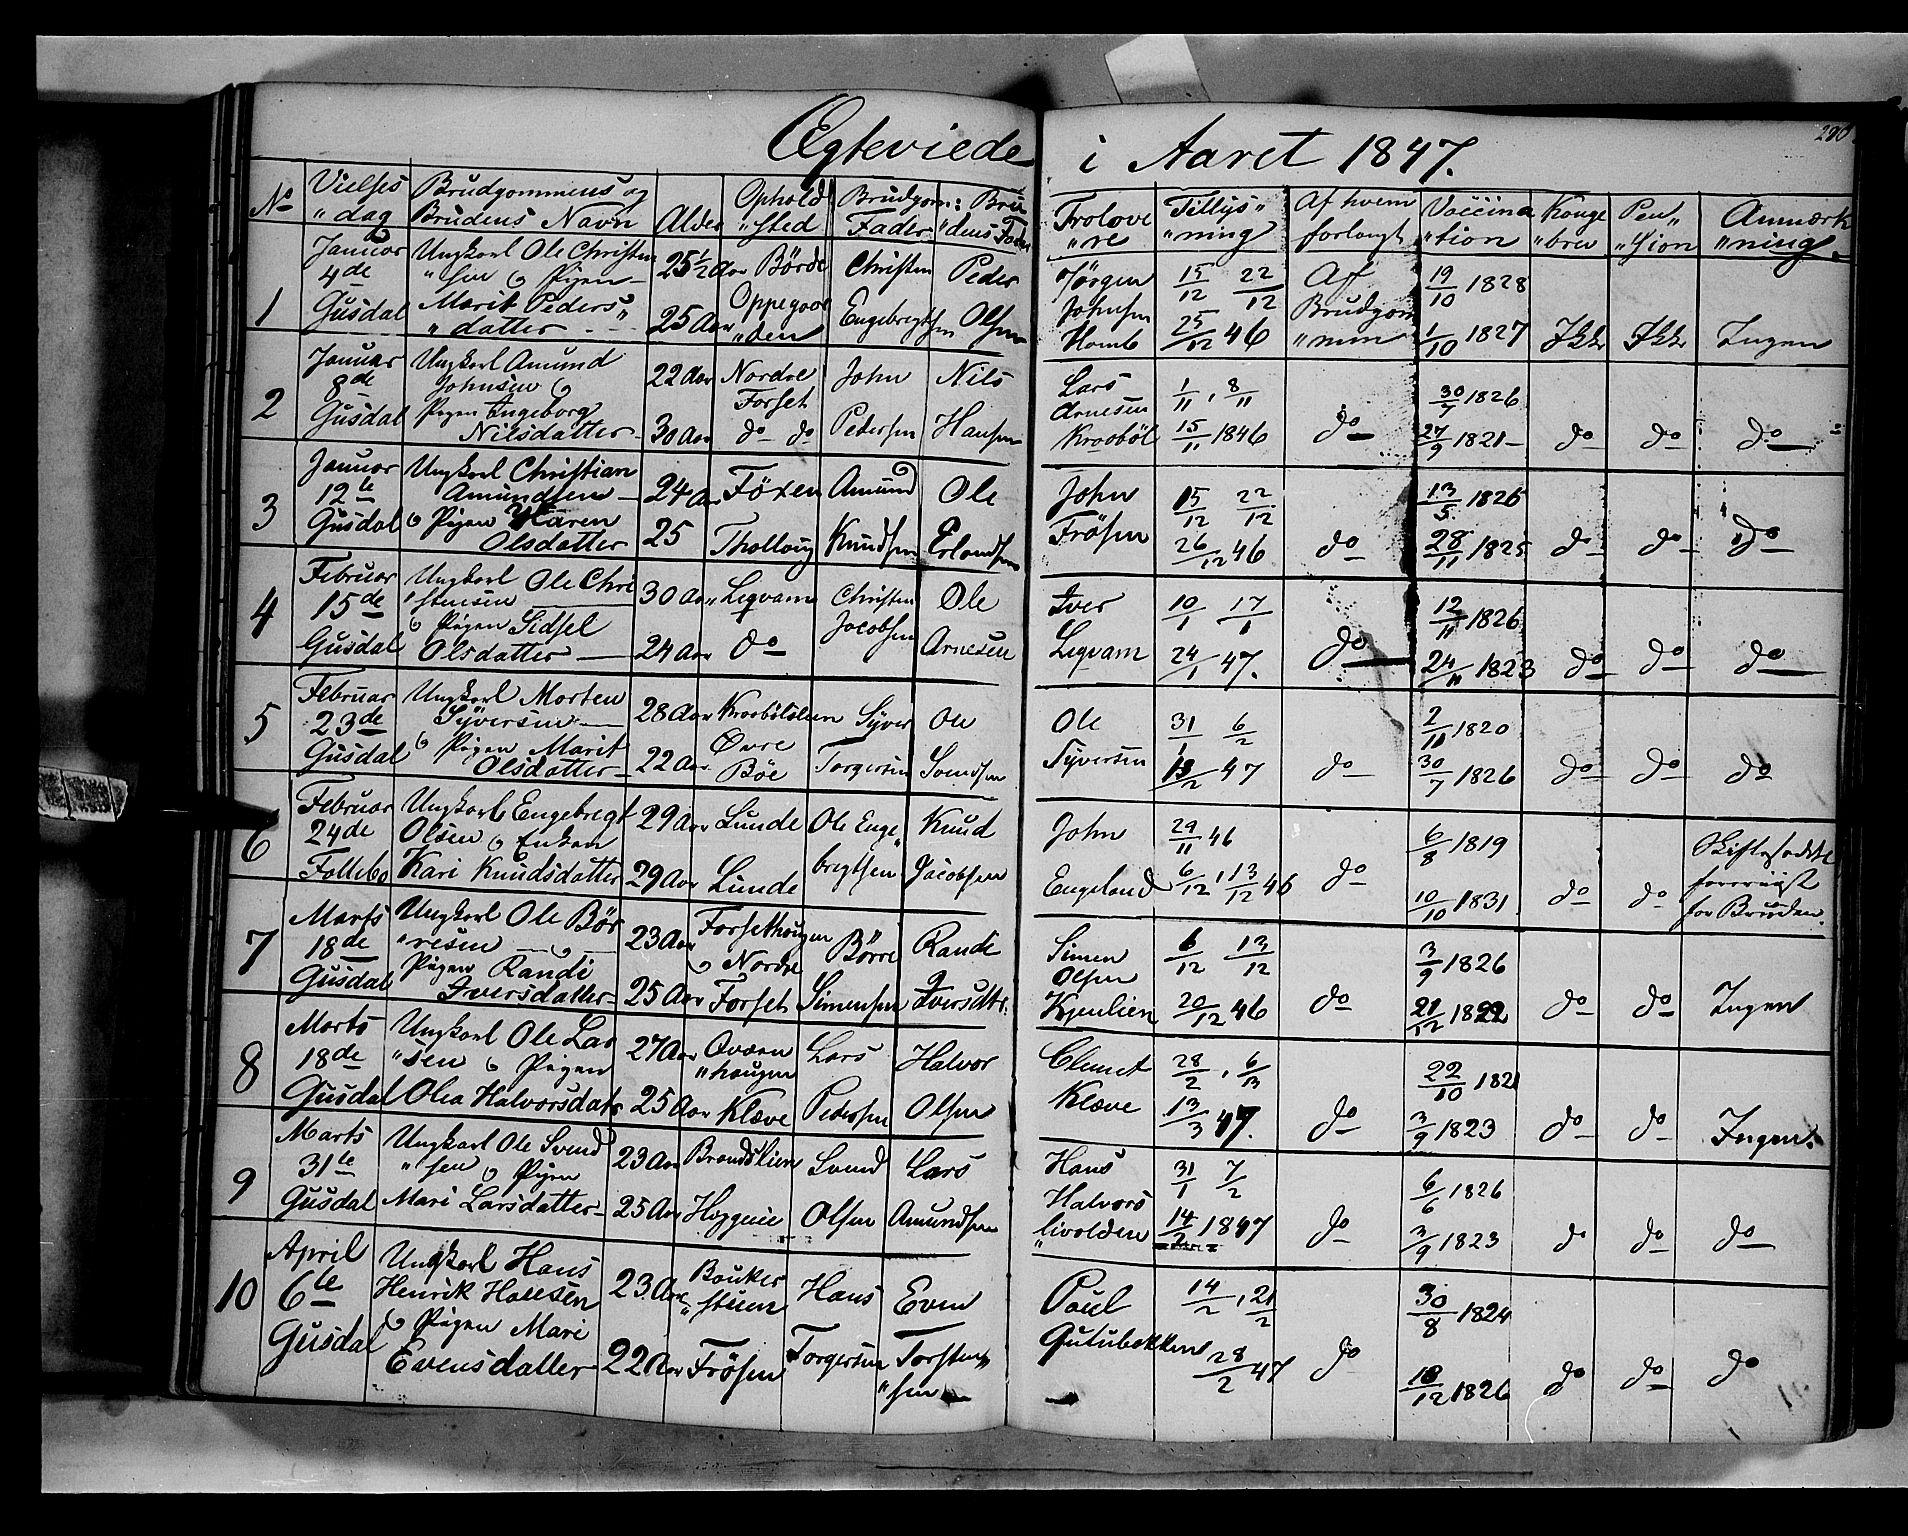 SAH, Gausdal prestekontor, Ministerialbok nr. 7, 1840-1850, s. 230